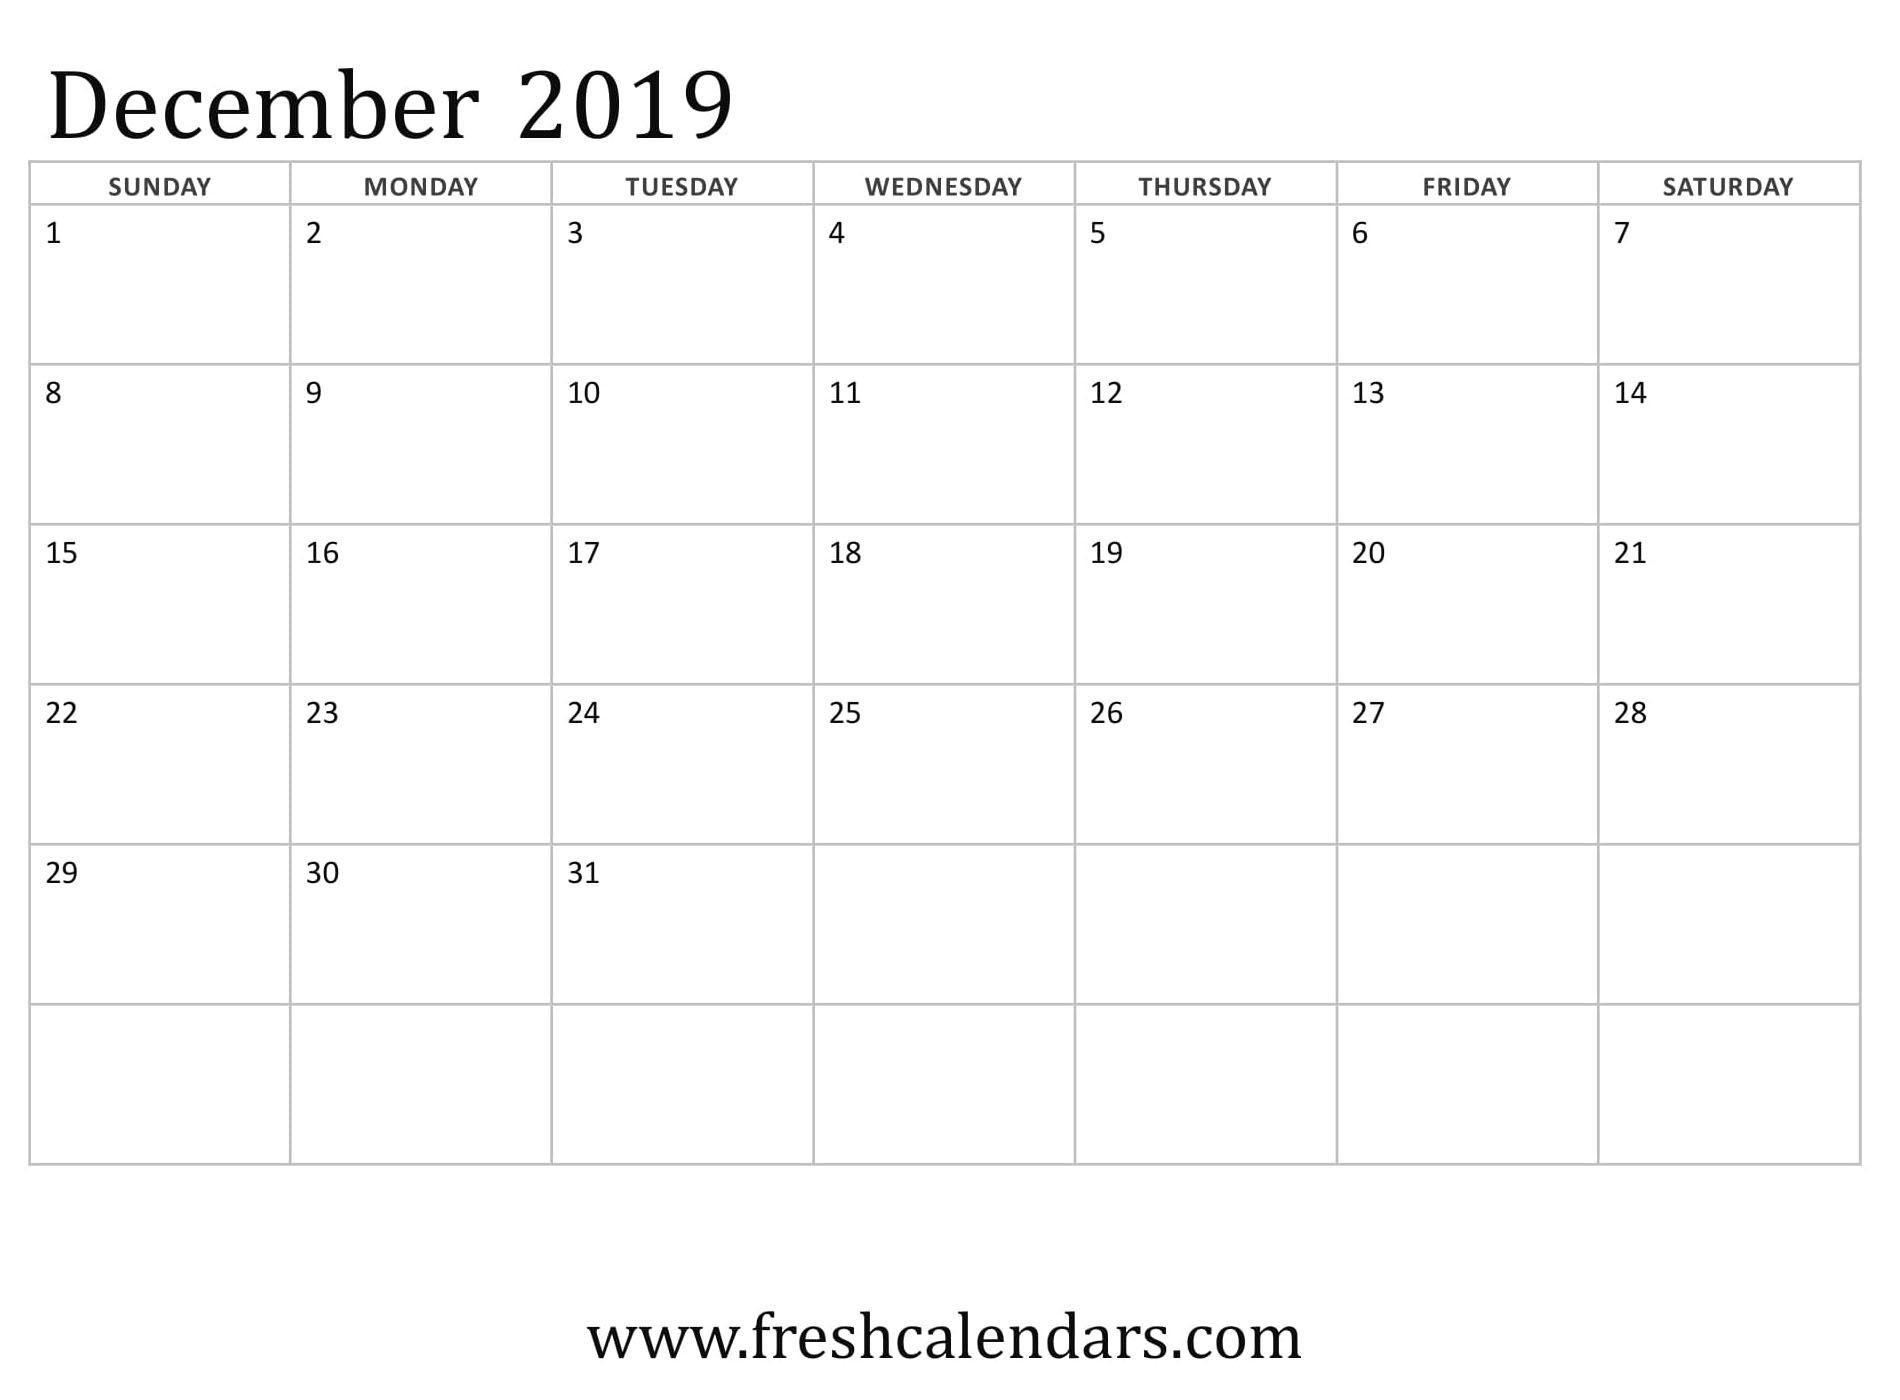 December 2019 Calendar Printable - Fresh Calendars Dowload